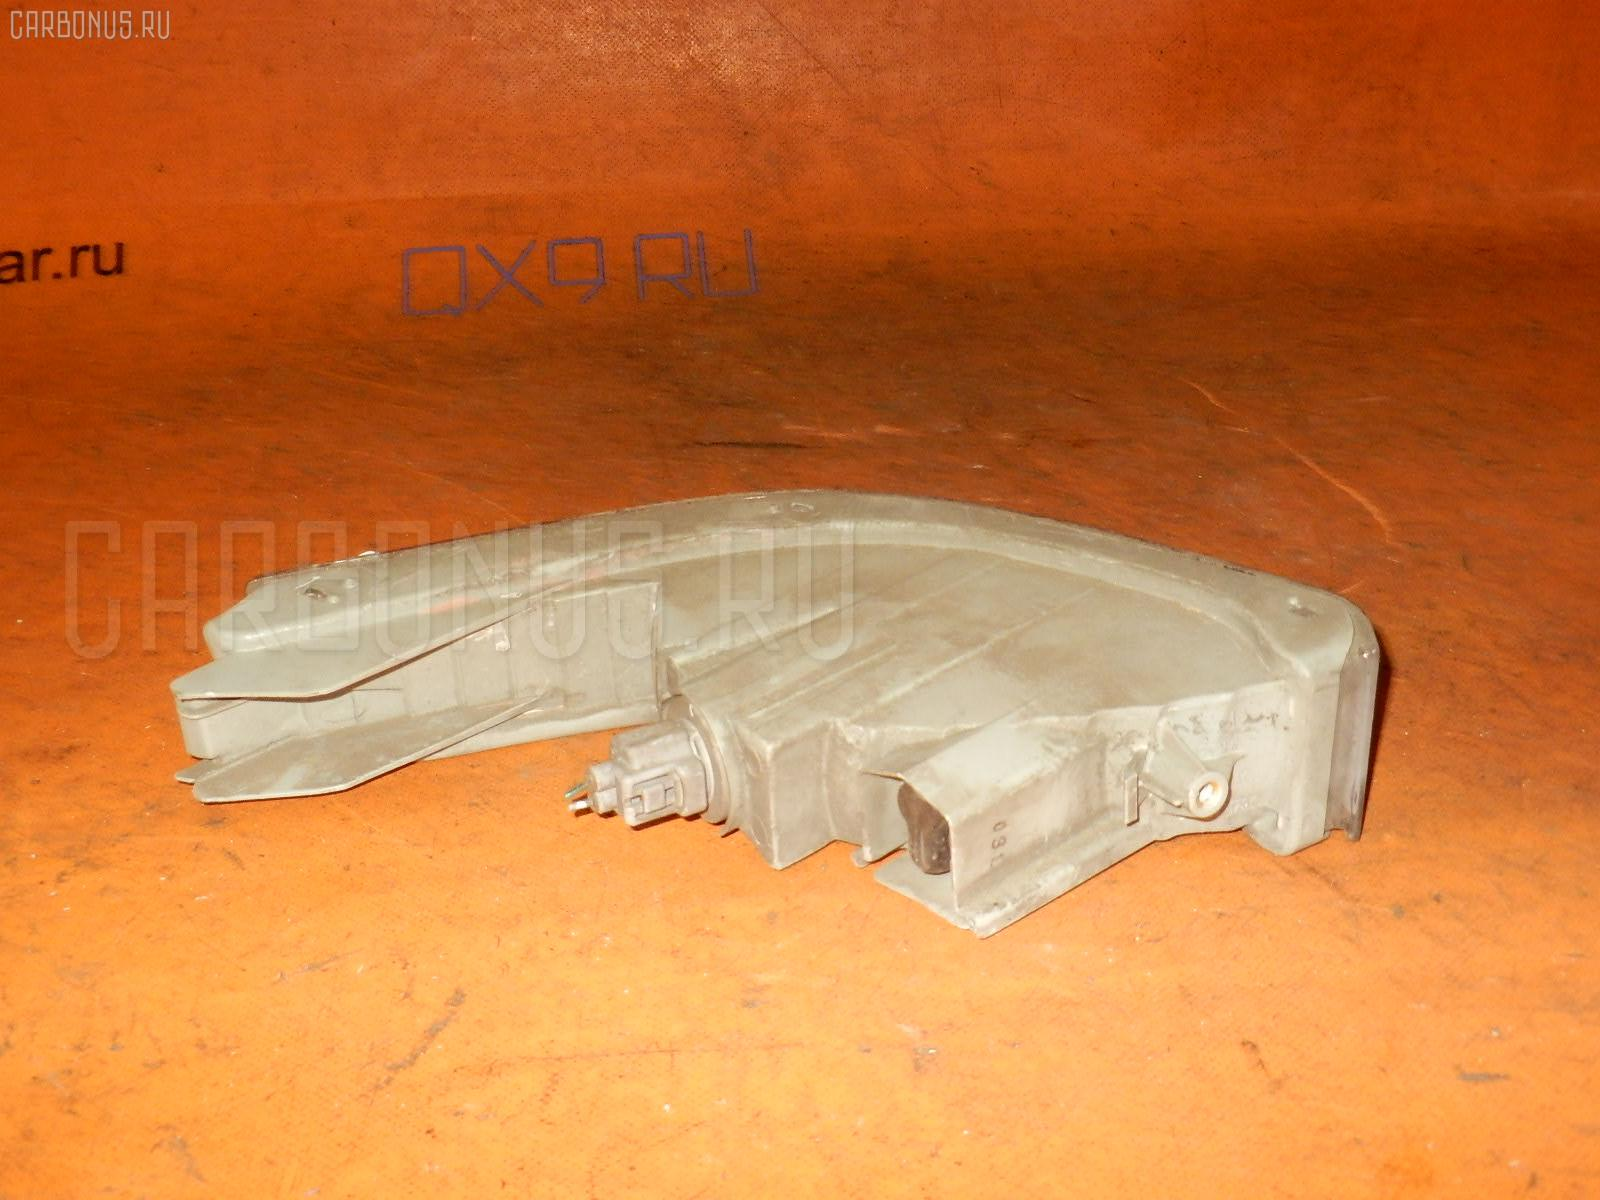 Поворотник бамперный TOYOTA MARK II GX100 Фото 2